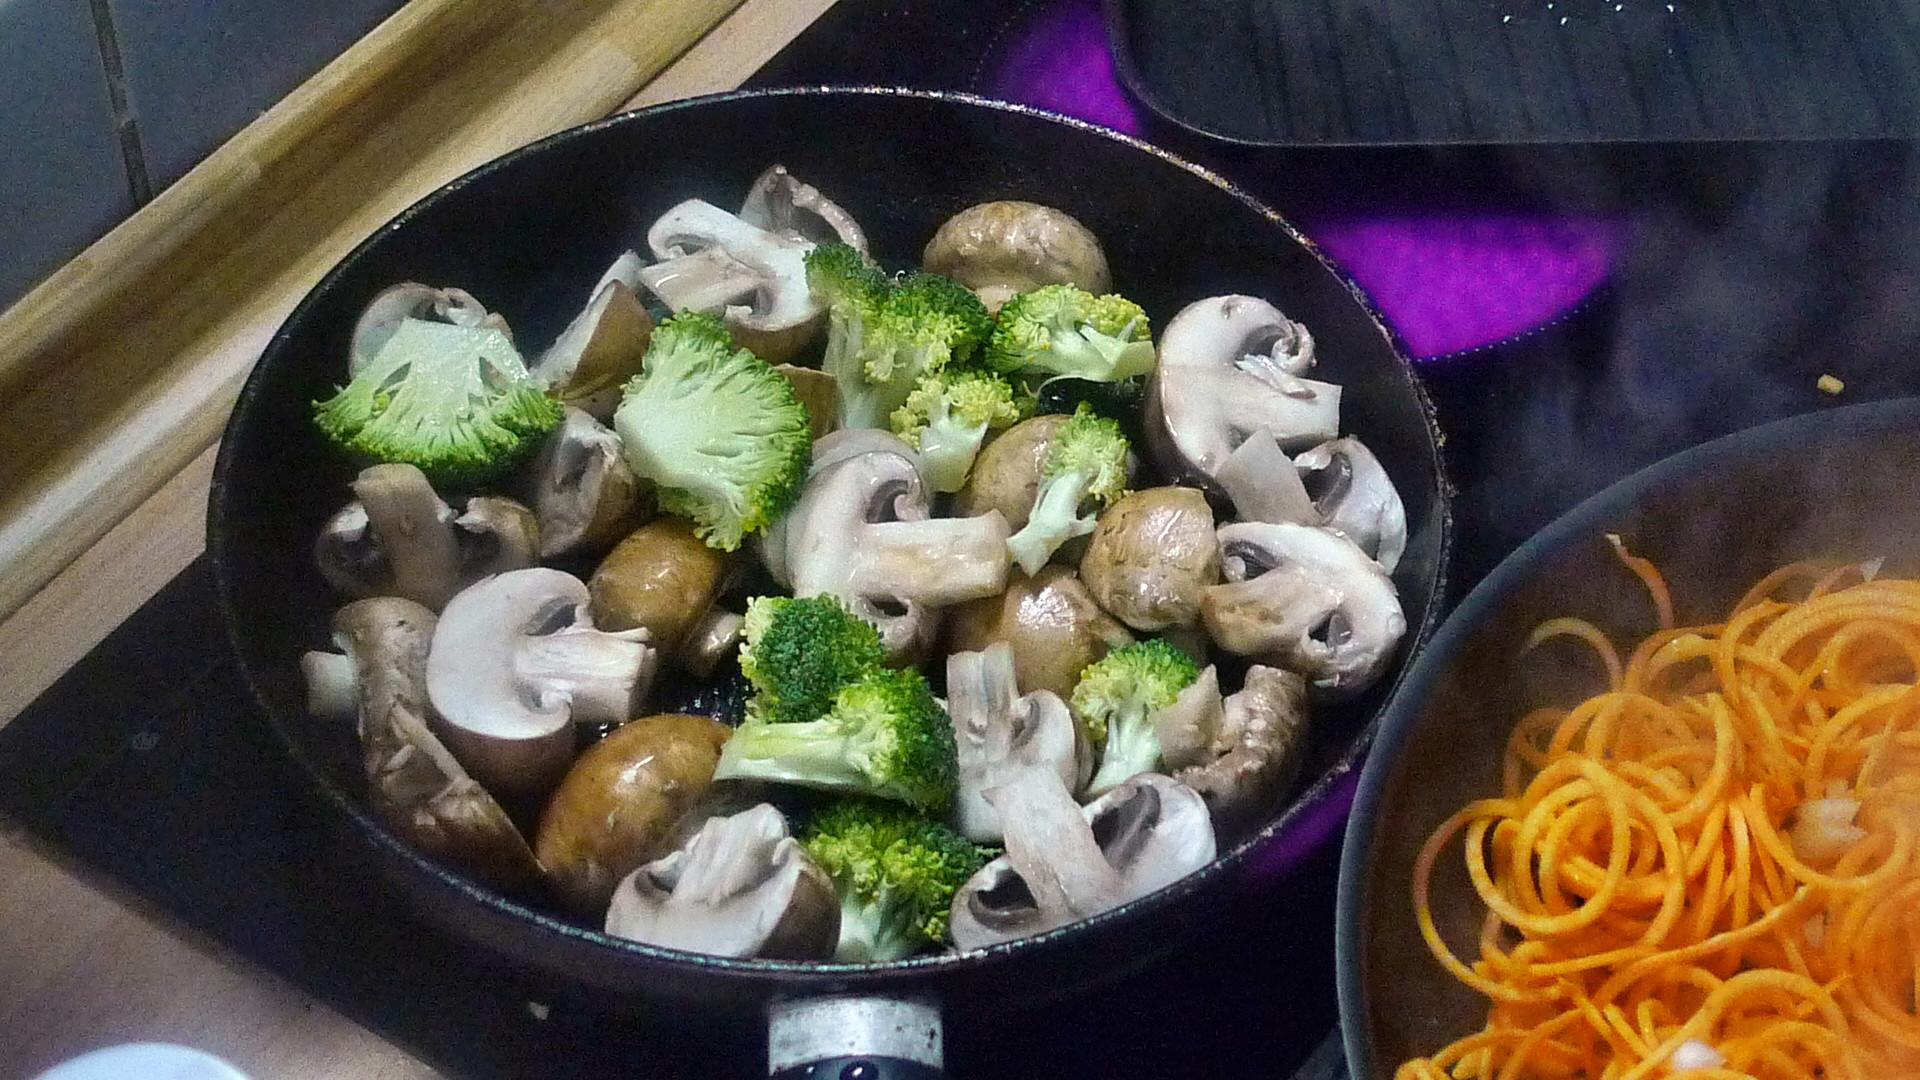 Gemüsespaghetti mit Champignon,Kohlrabisalat,Tomatensalat,vegan -5.5.15   (6)